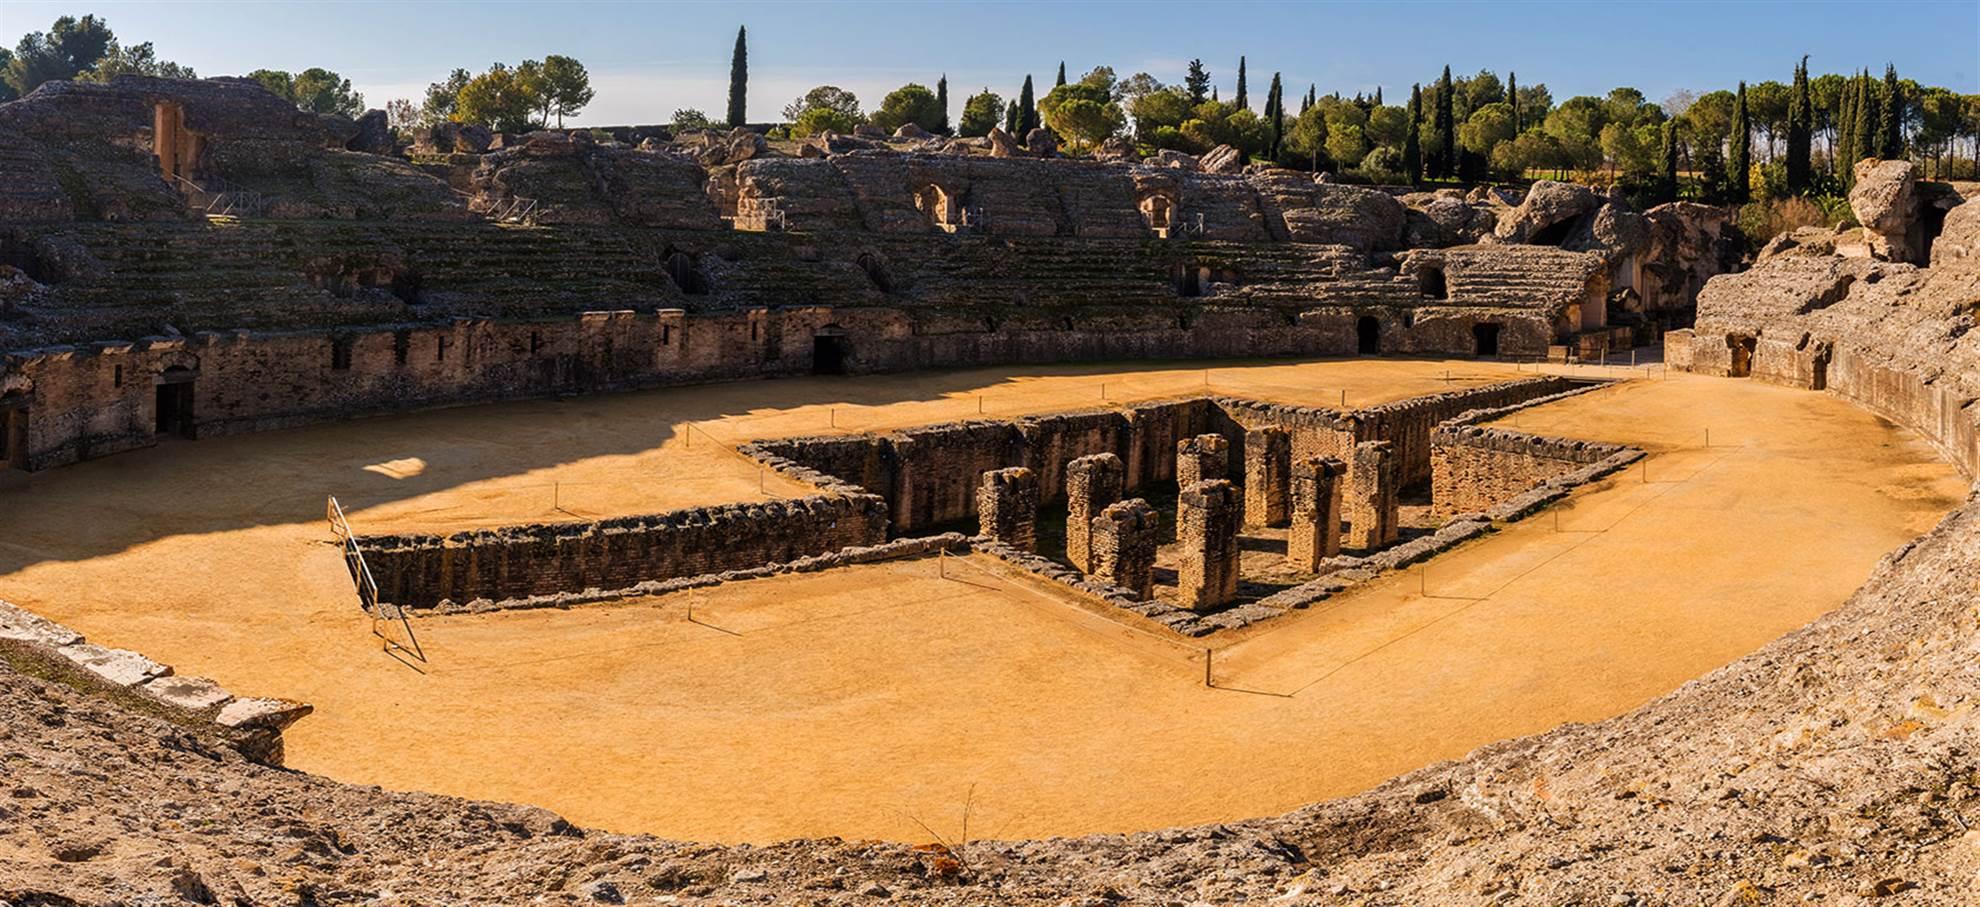 Italica (Historische Römische Stadt)